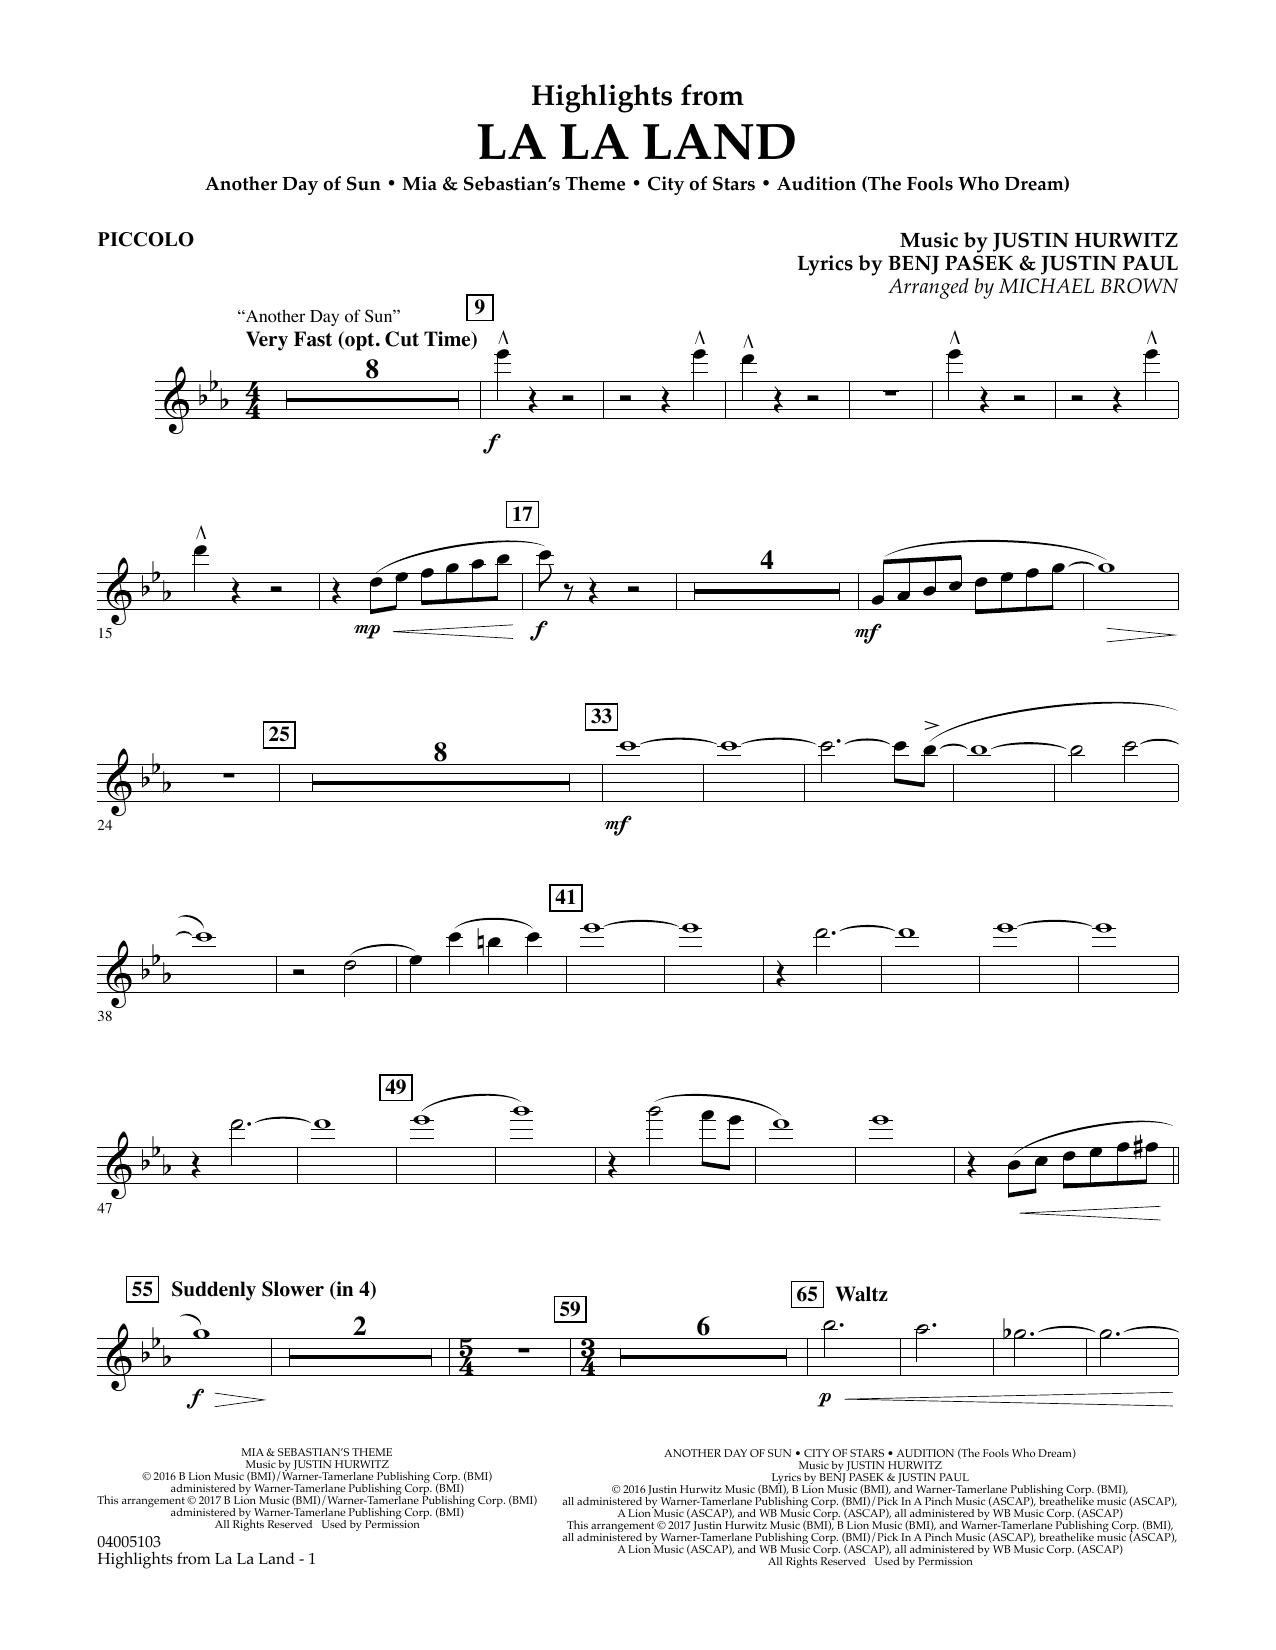 Highlights from La La Land - Piccolo (Concert Band)